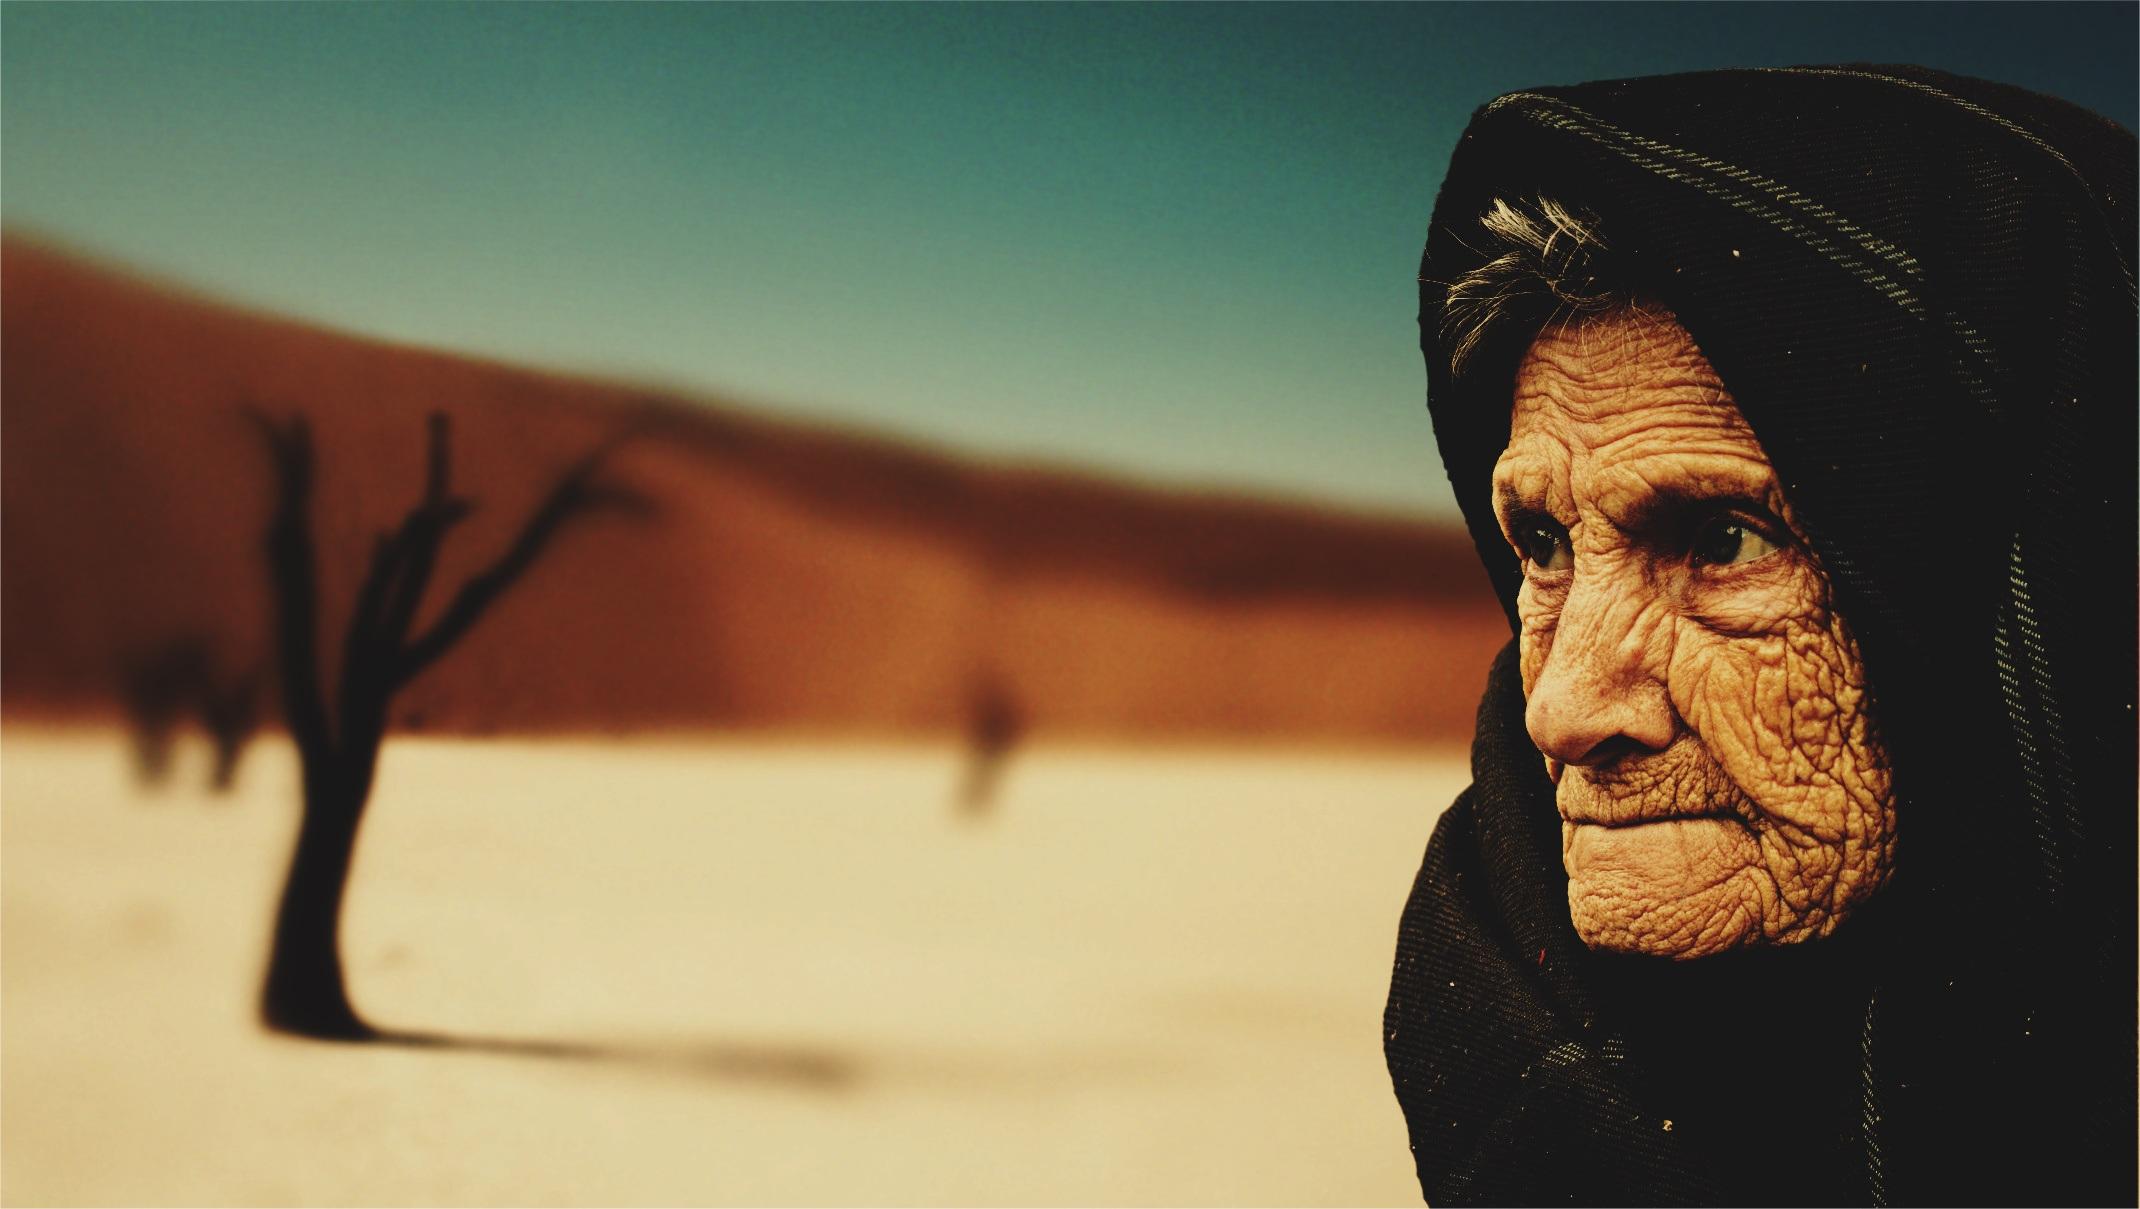 old-woman-574278.jpg